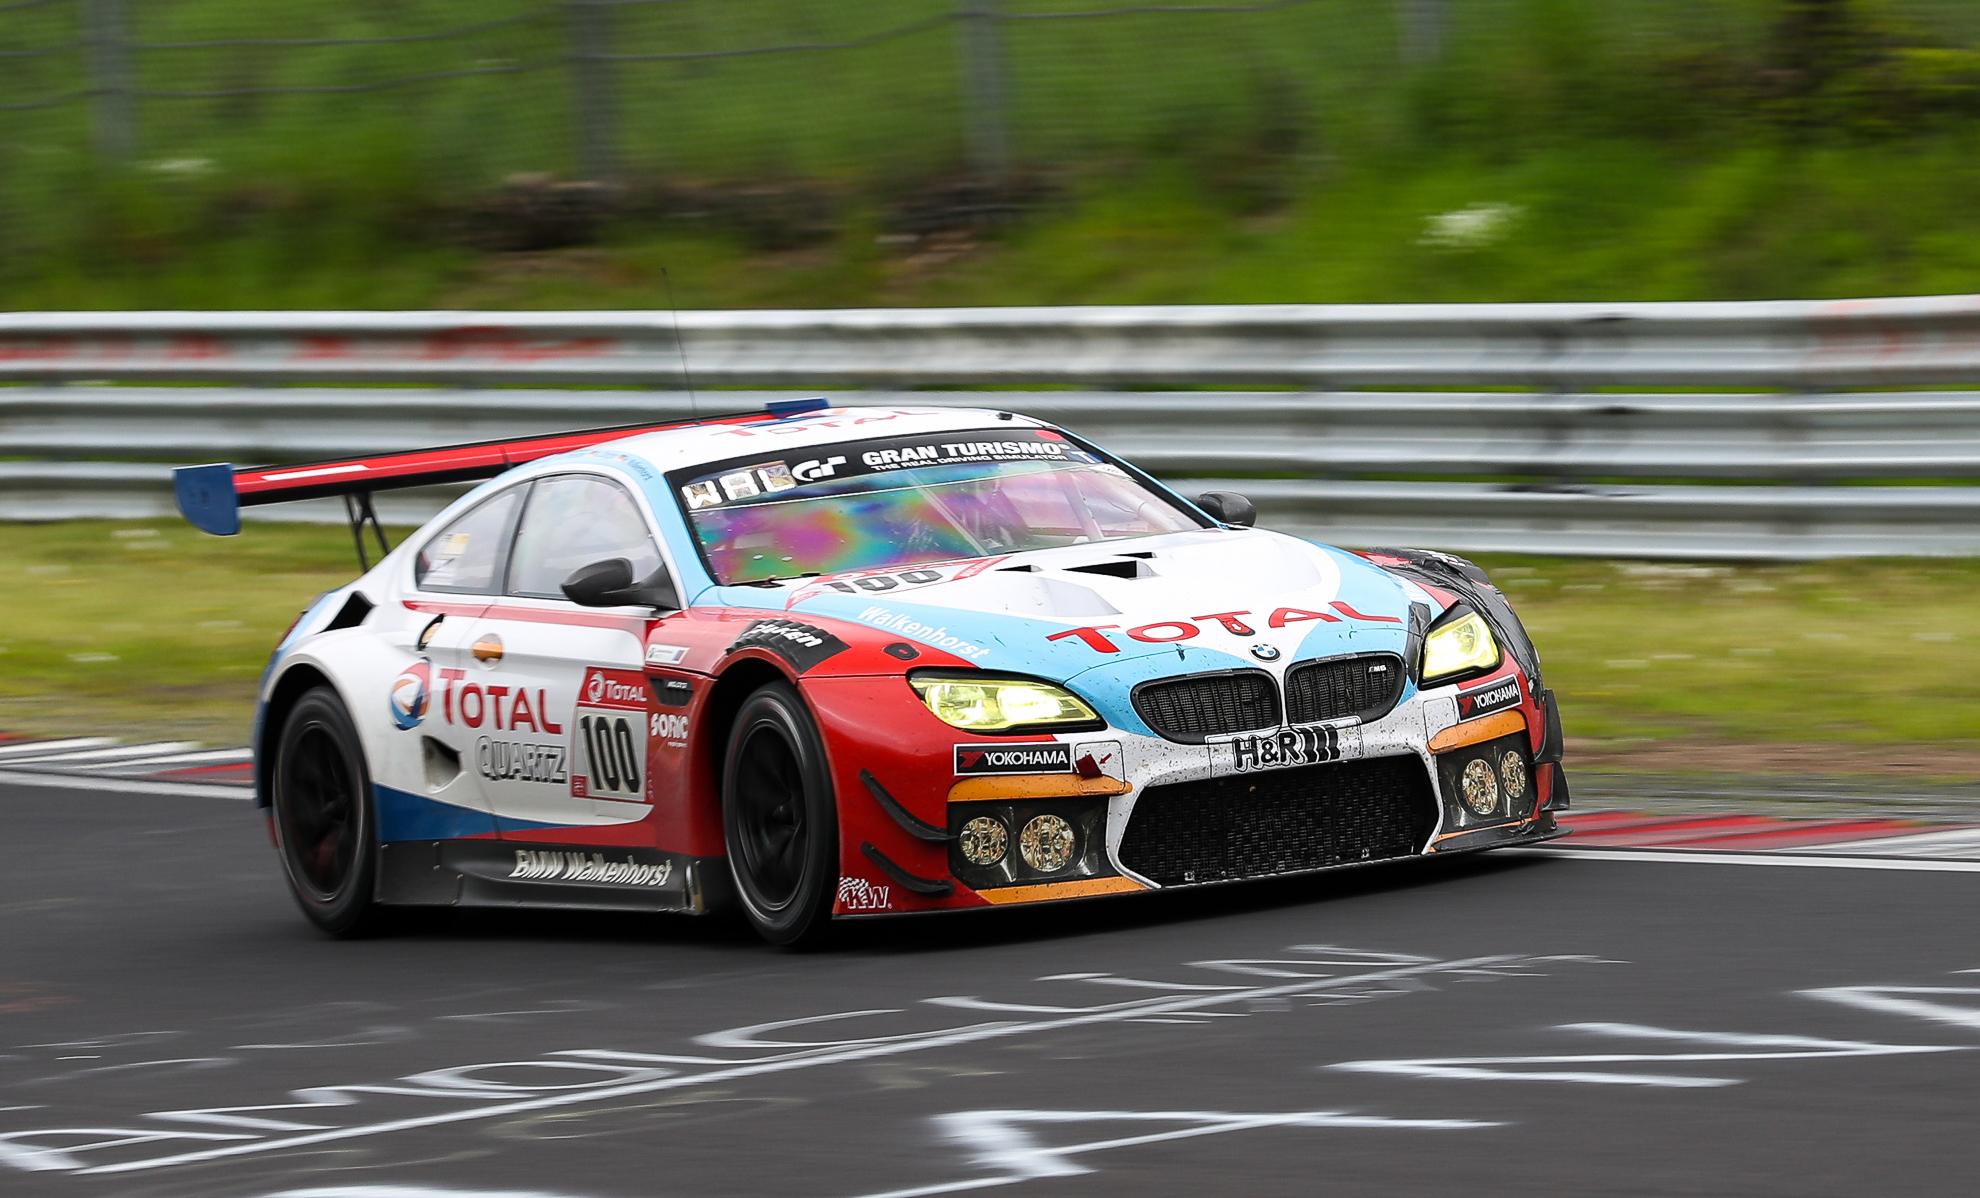 BMW_M6_GT3_Total_24h_Nuerburgring_2019.jpg